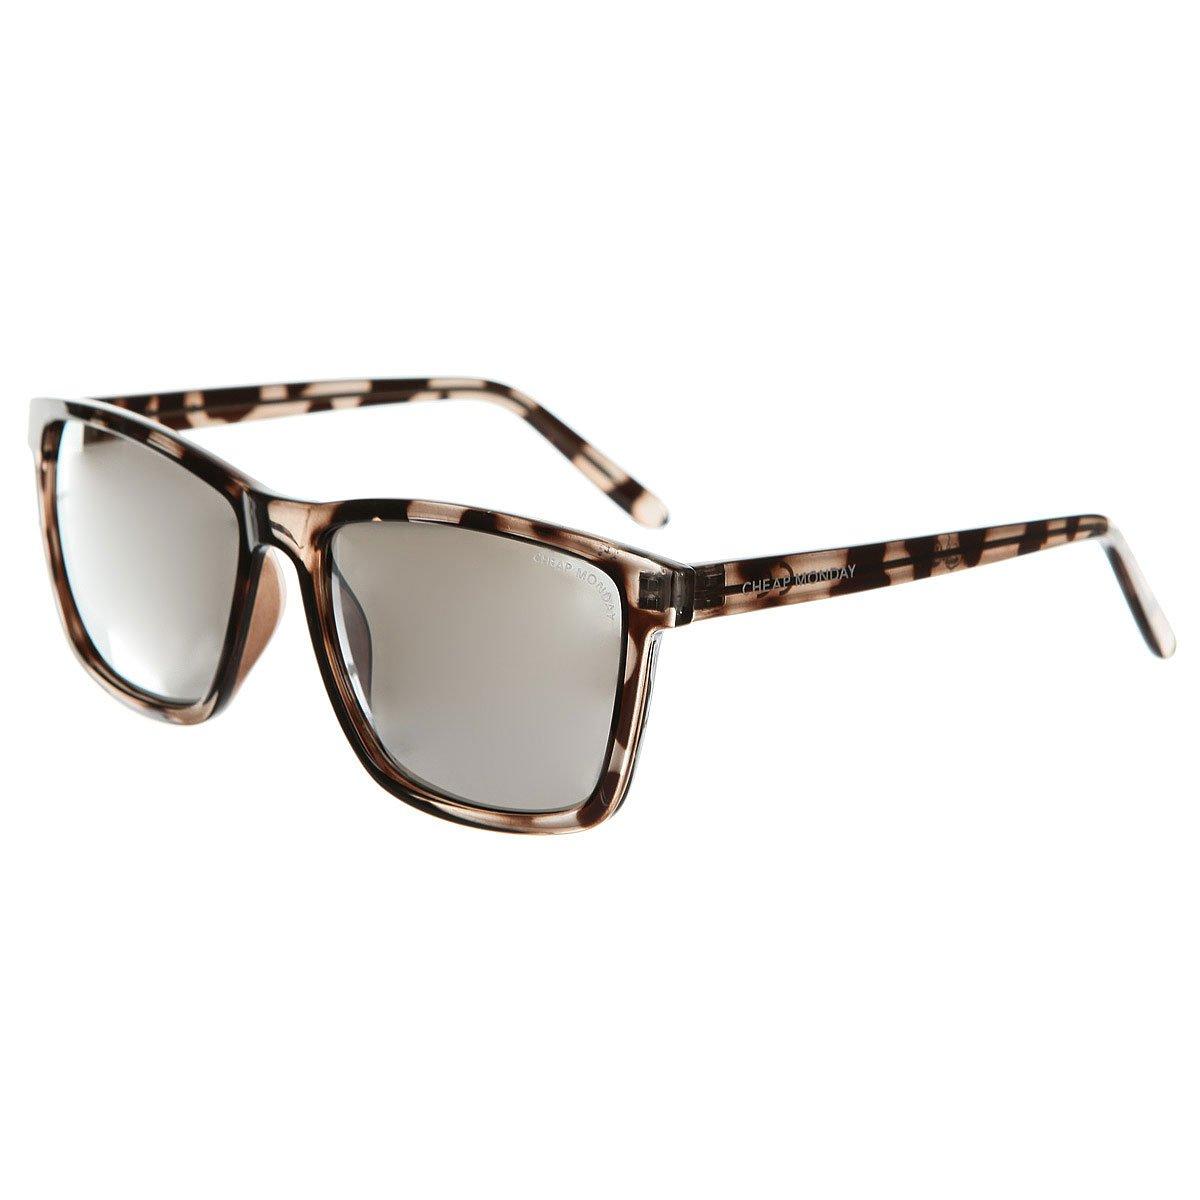 908708da06 Купить очки Cheap Monday Straight Prison Turtle Grey в интернет ...